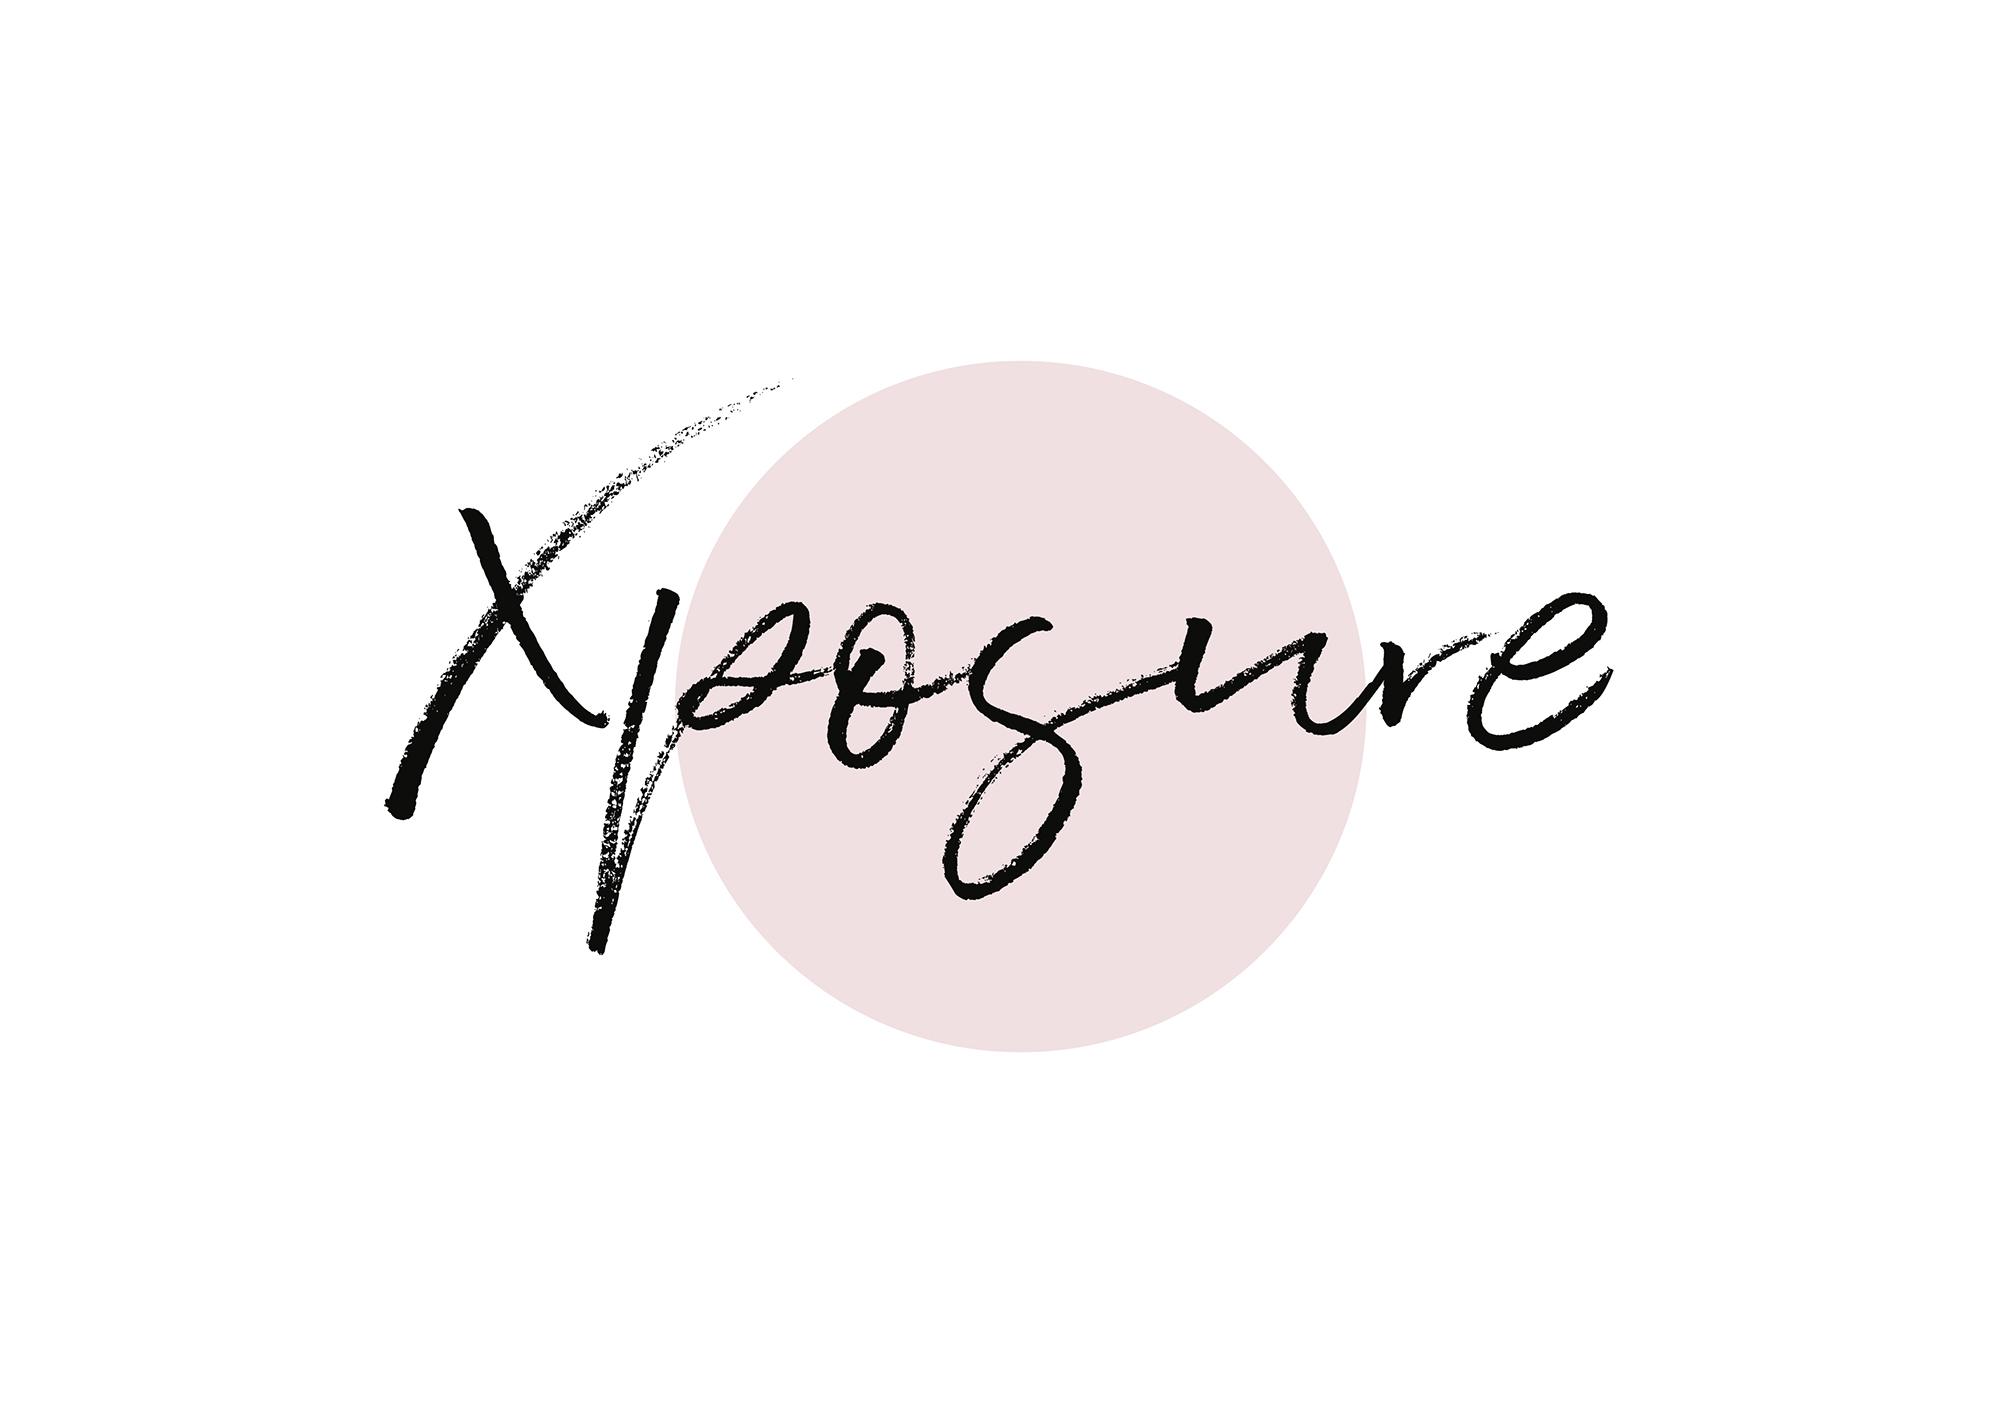 Xposure studios logo boudoir makeover photography studio liverpool city centre